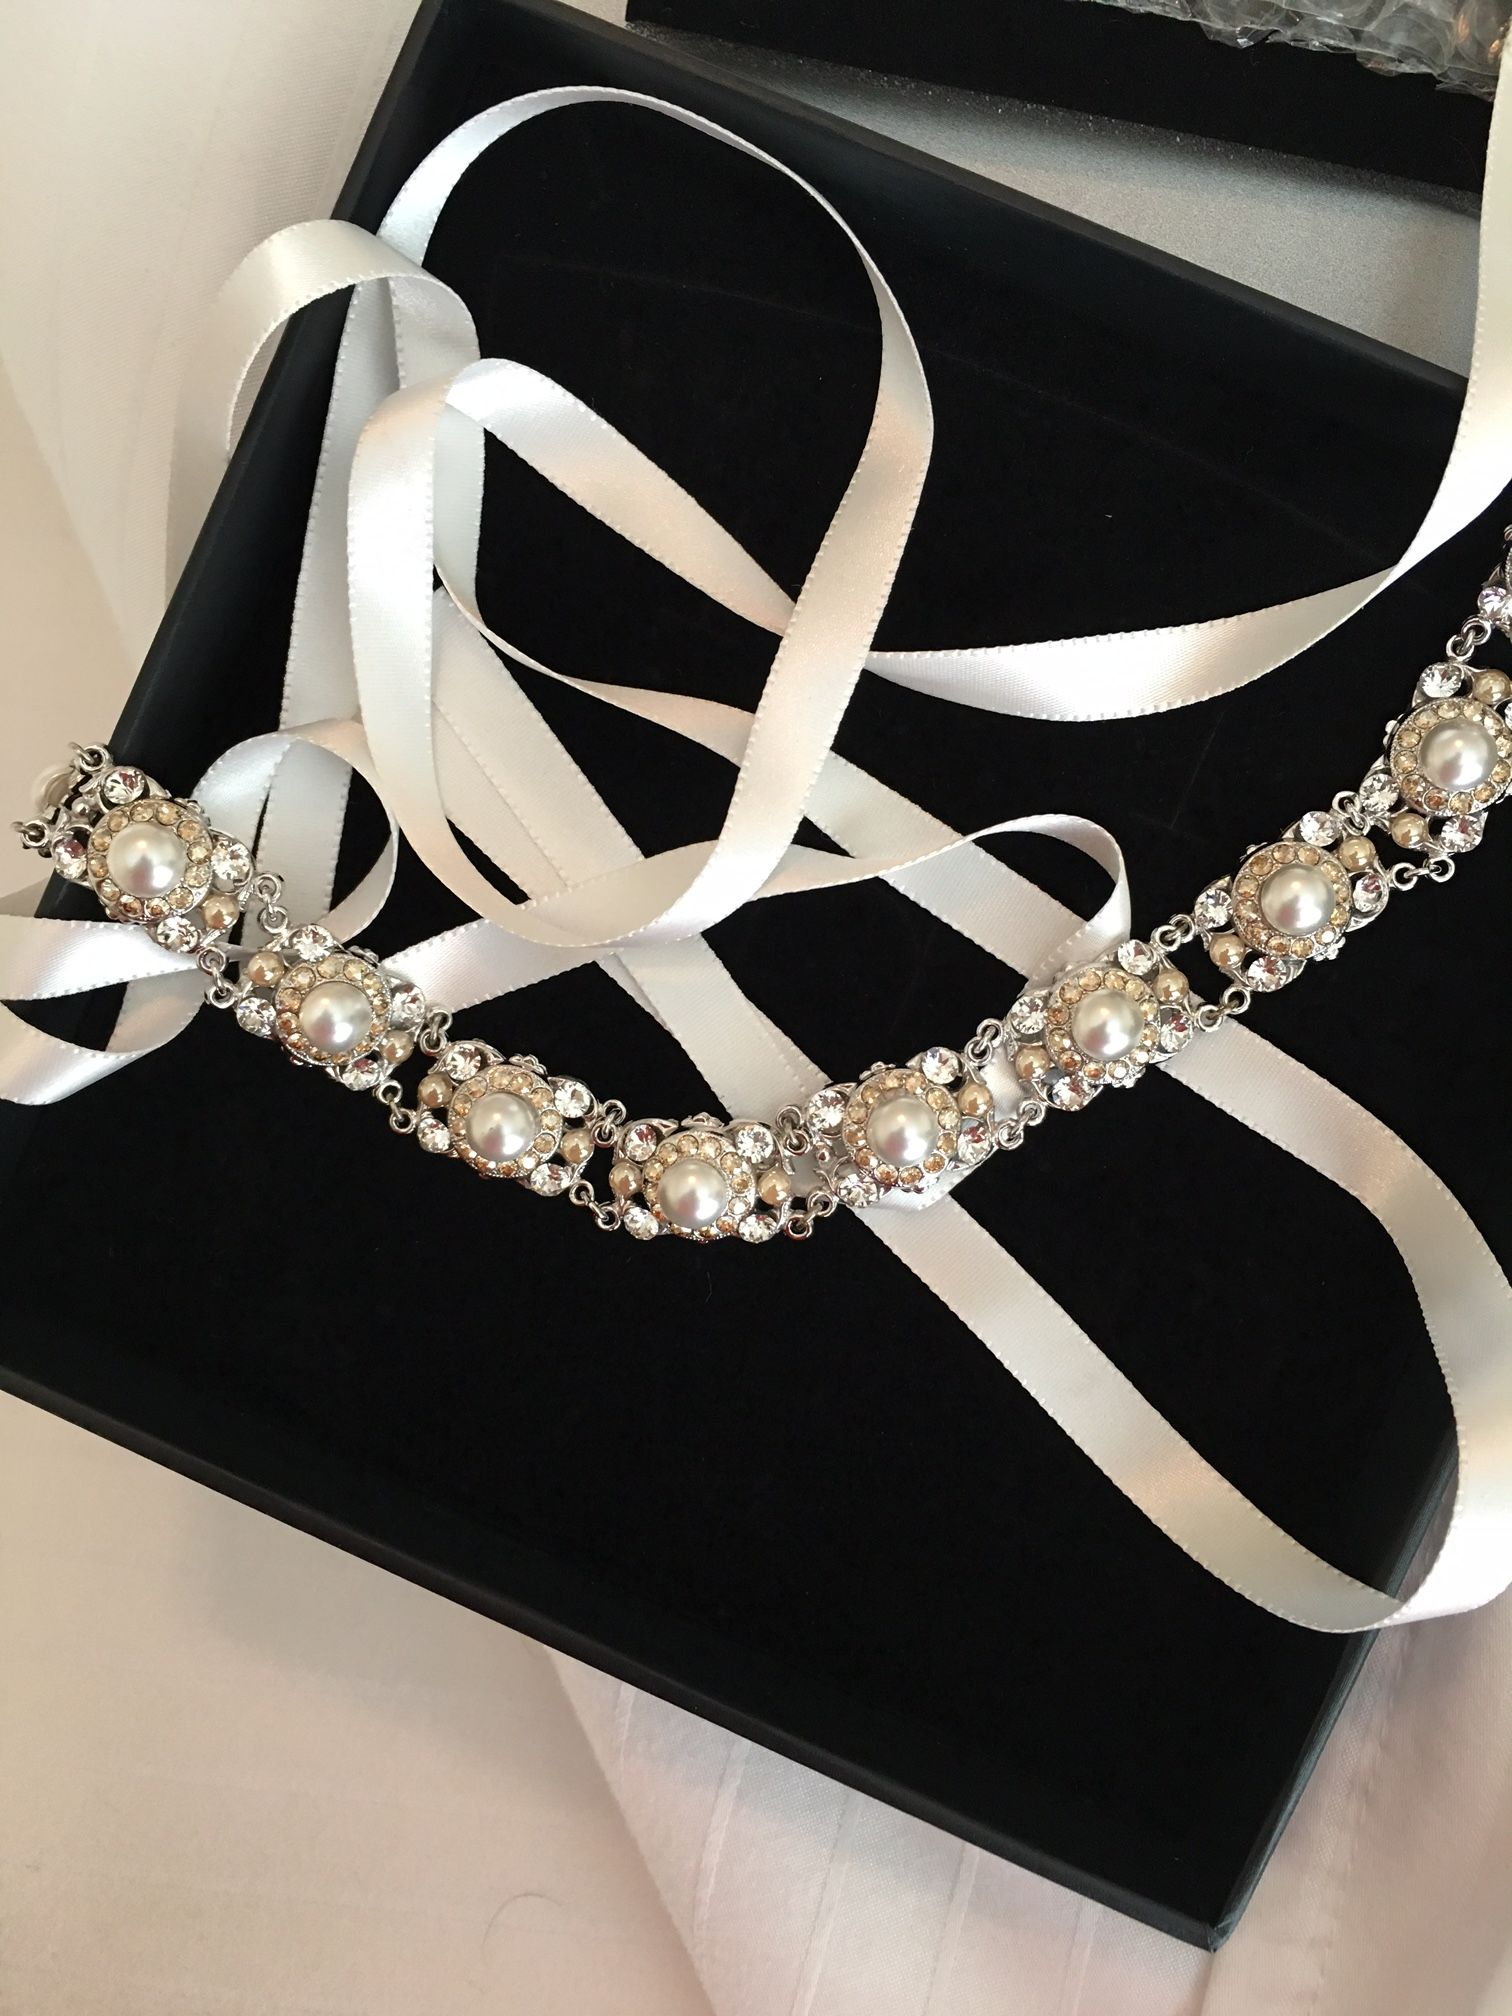 Belts for Wedding Dresses Thomas Knoell